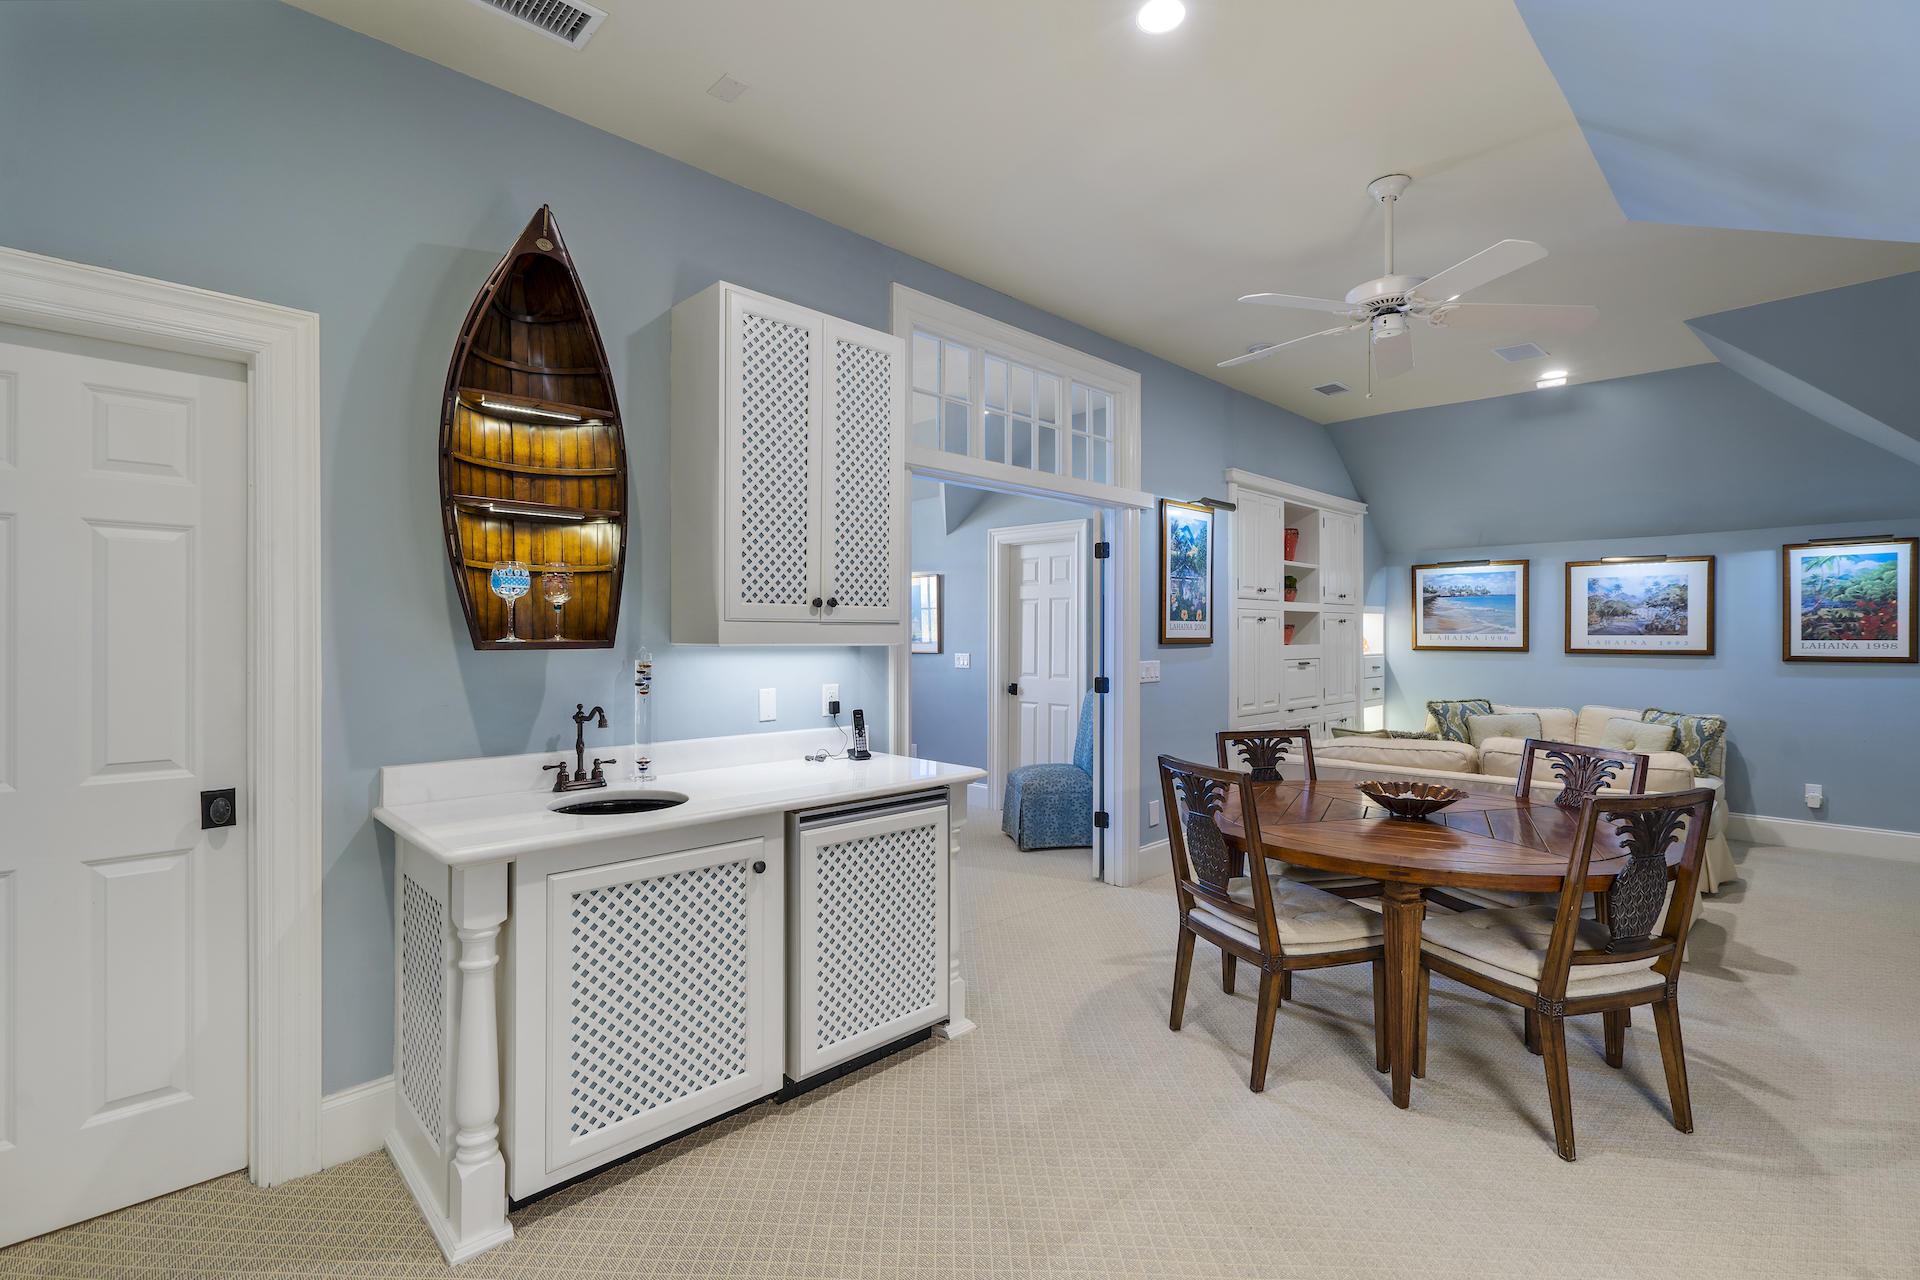 Daniel Island Homes For Sale - 623 Island Park, Charleston, SC - 9